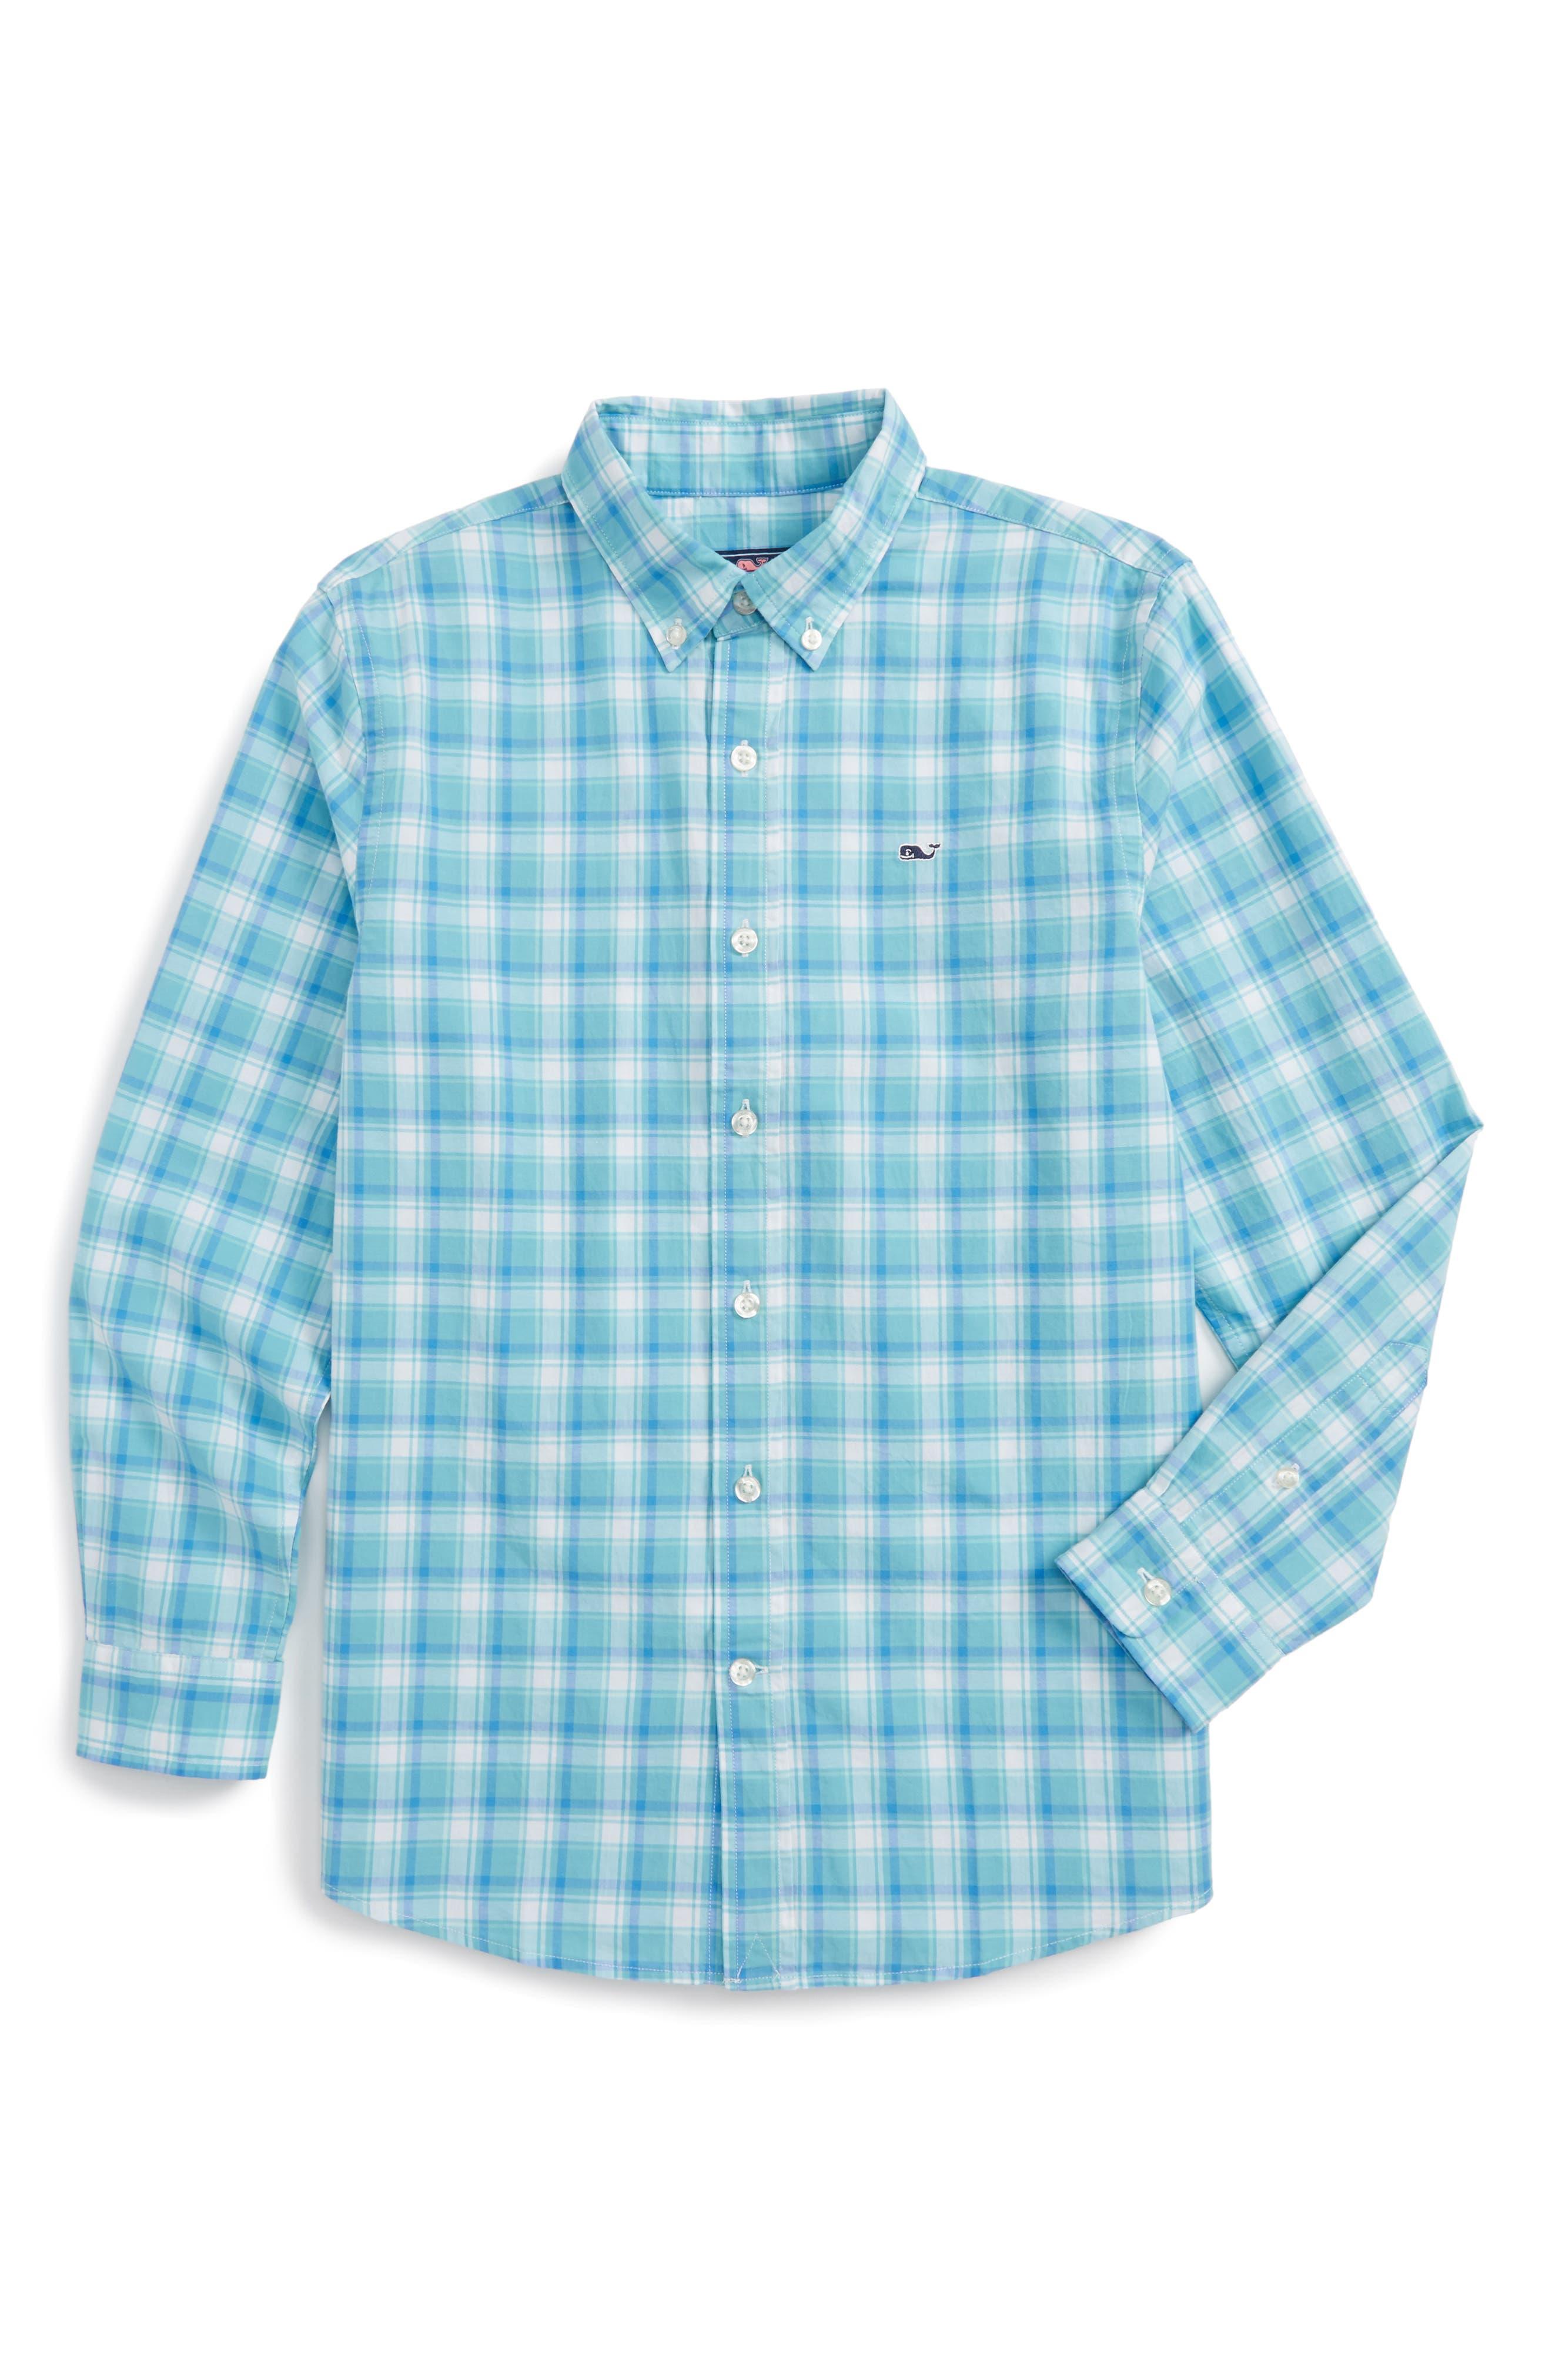 VINEYARD VINES Point Plaid Cotton Shirt